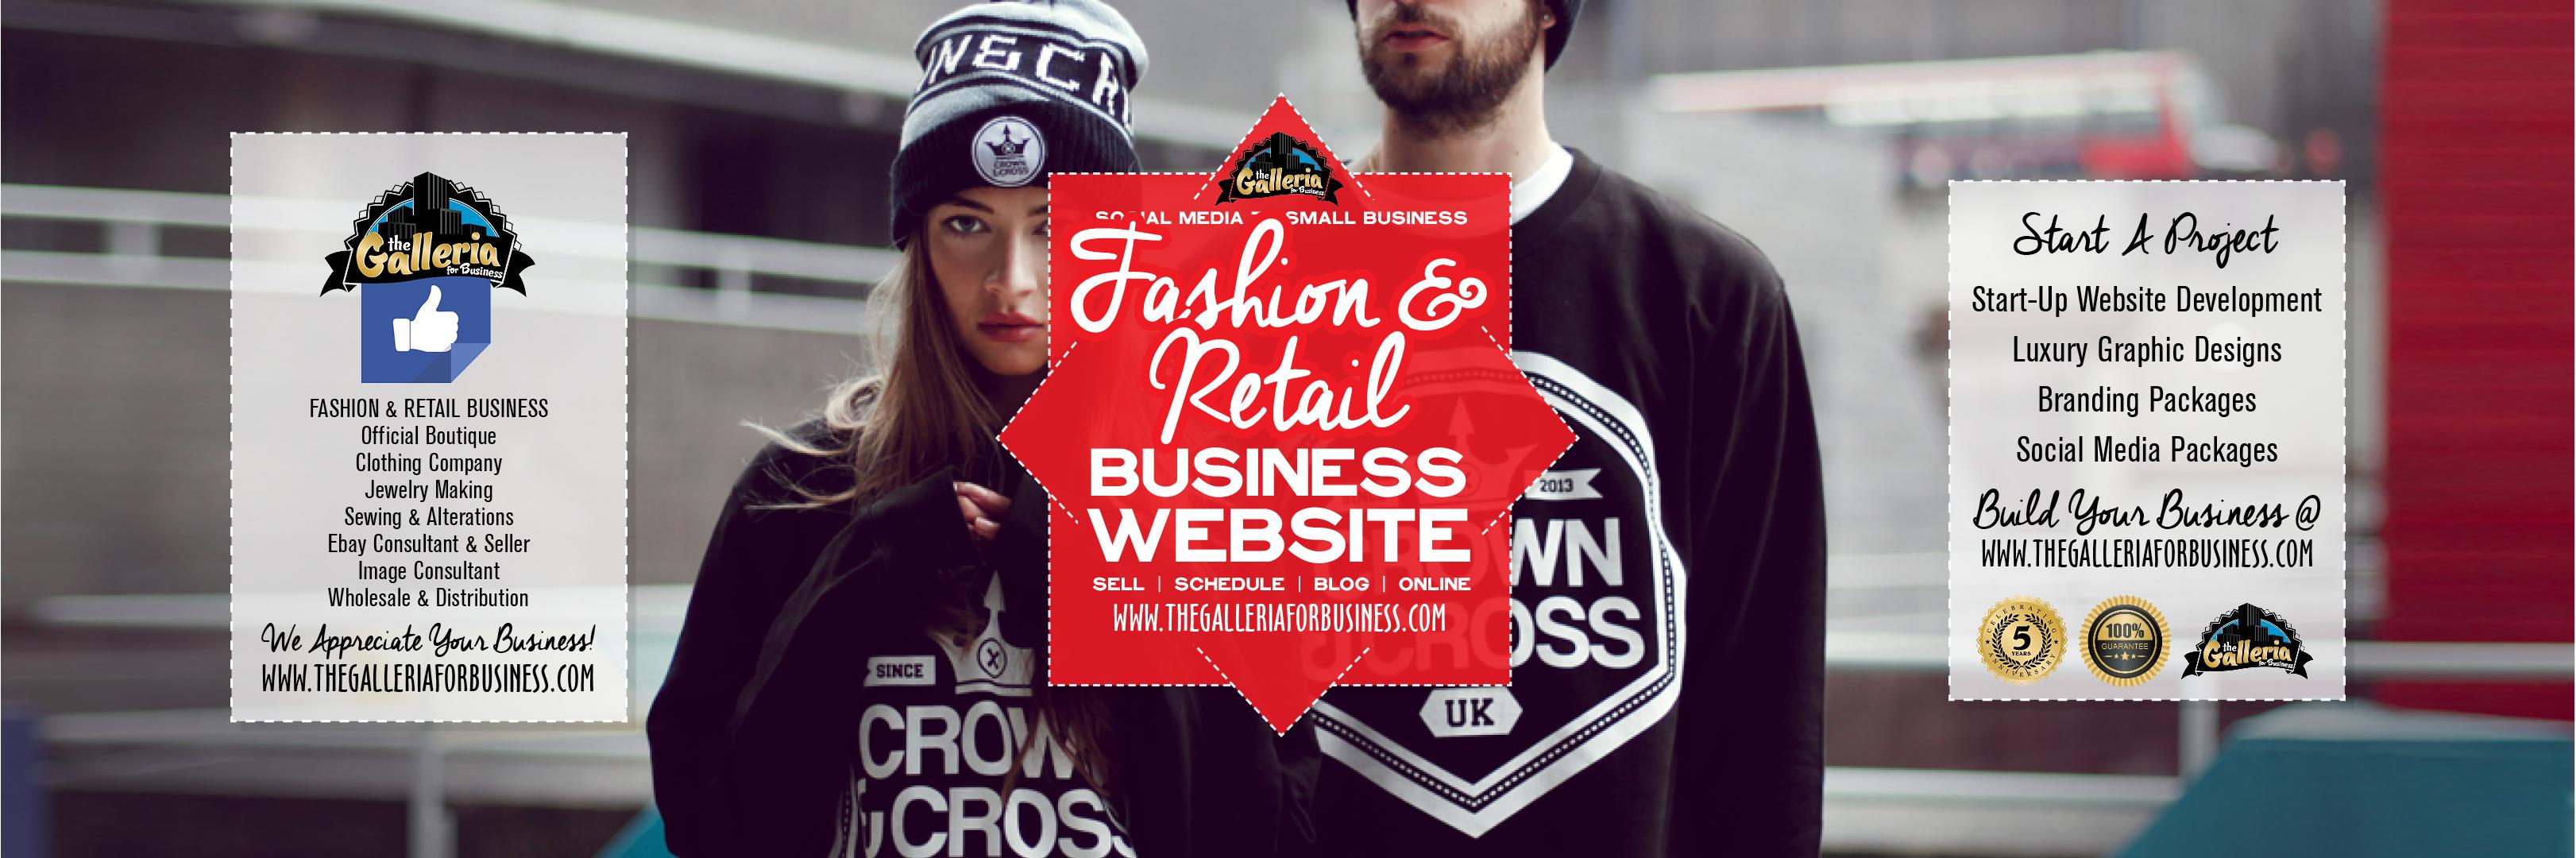 Fashion & Retail Business